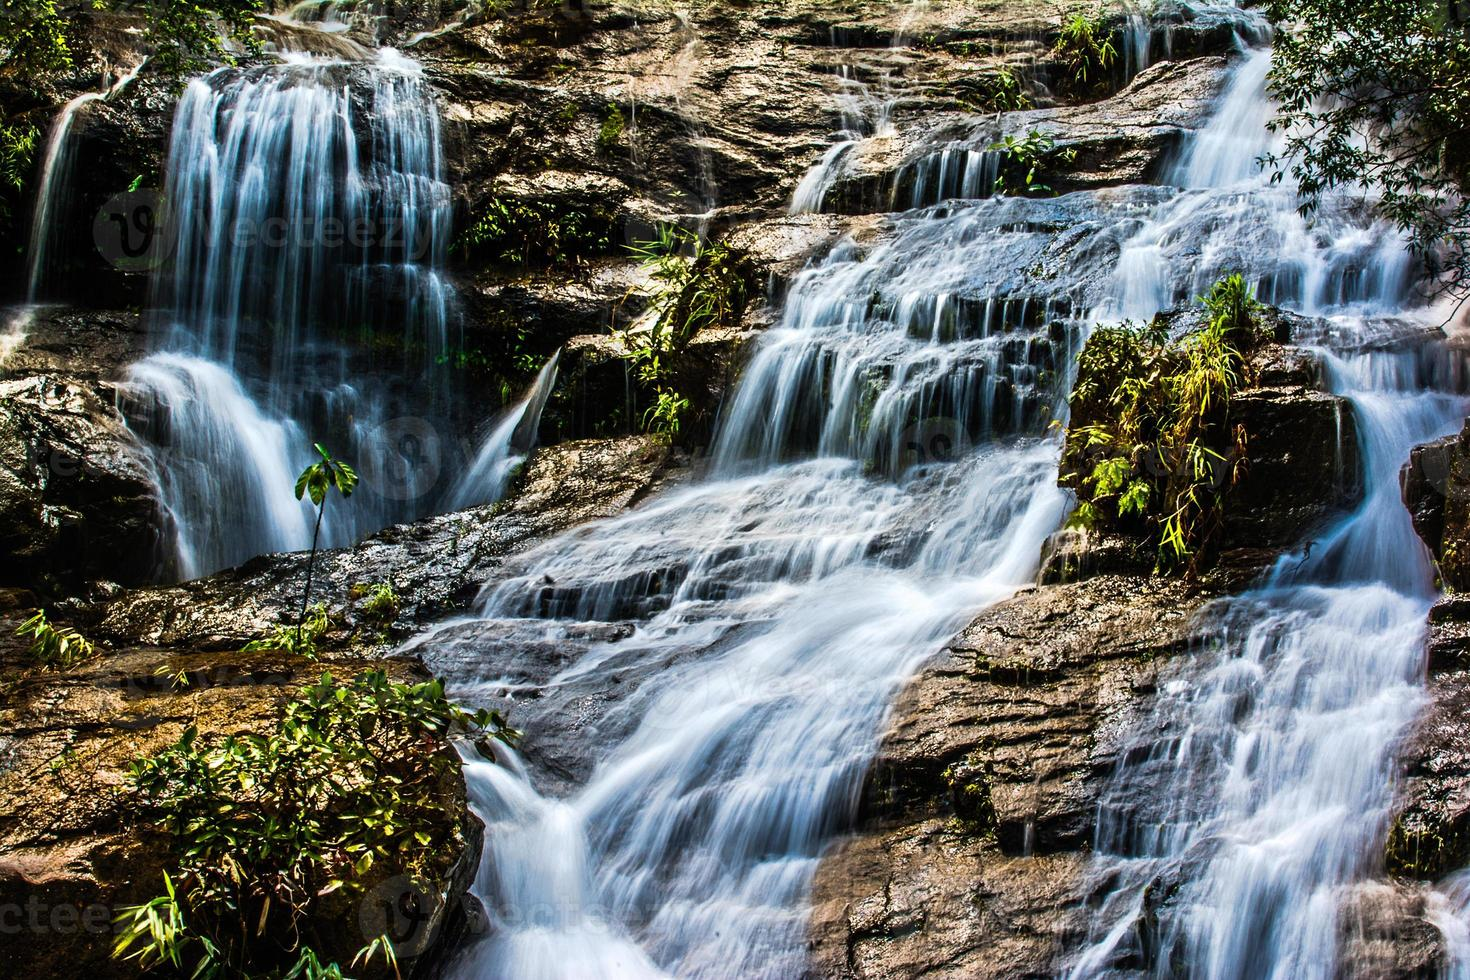 ngao waterfall, ranong province, thailand photo